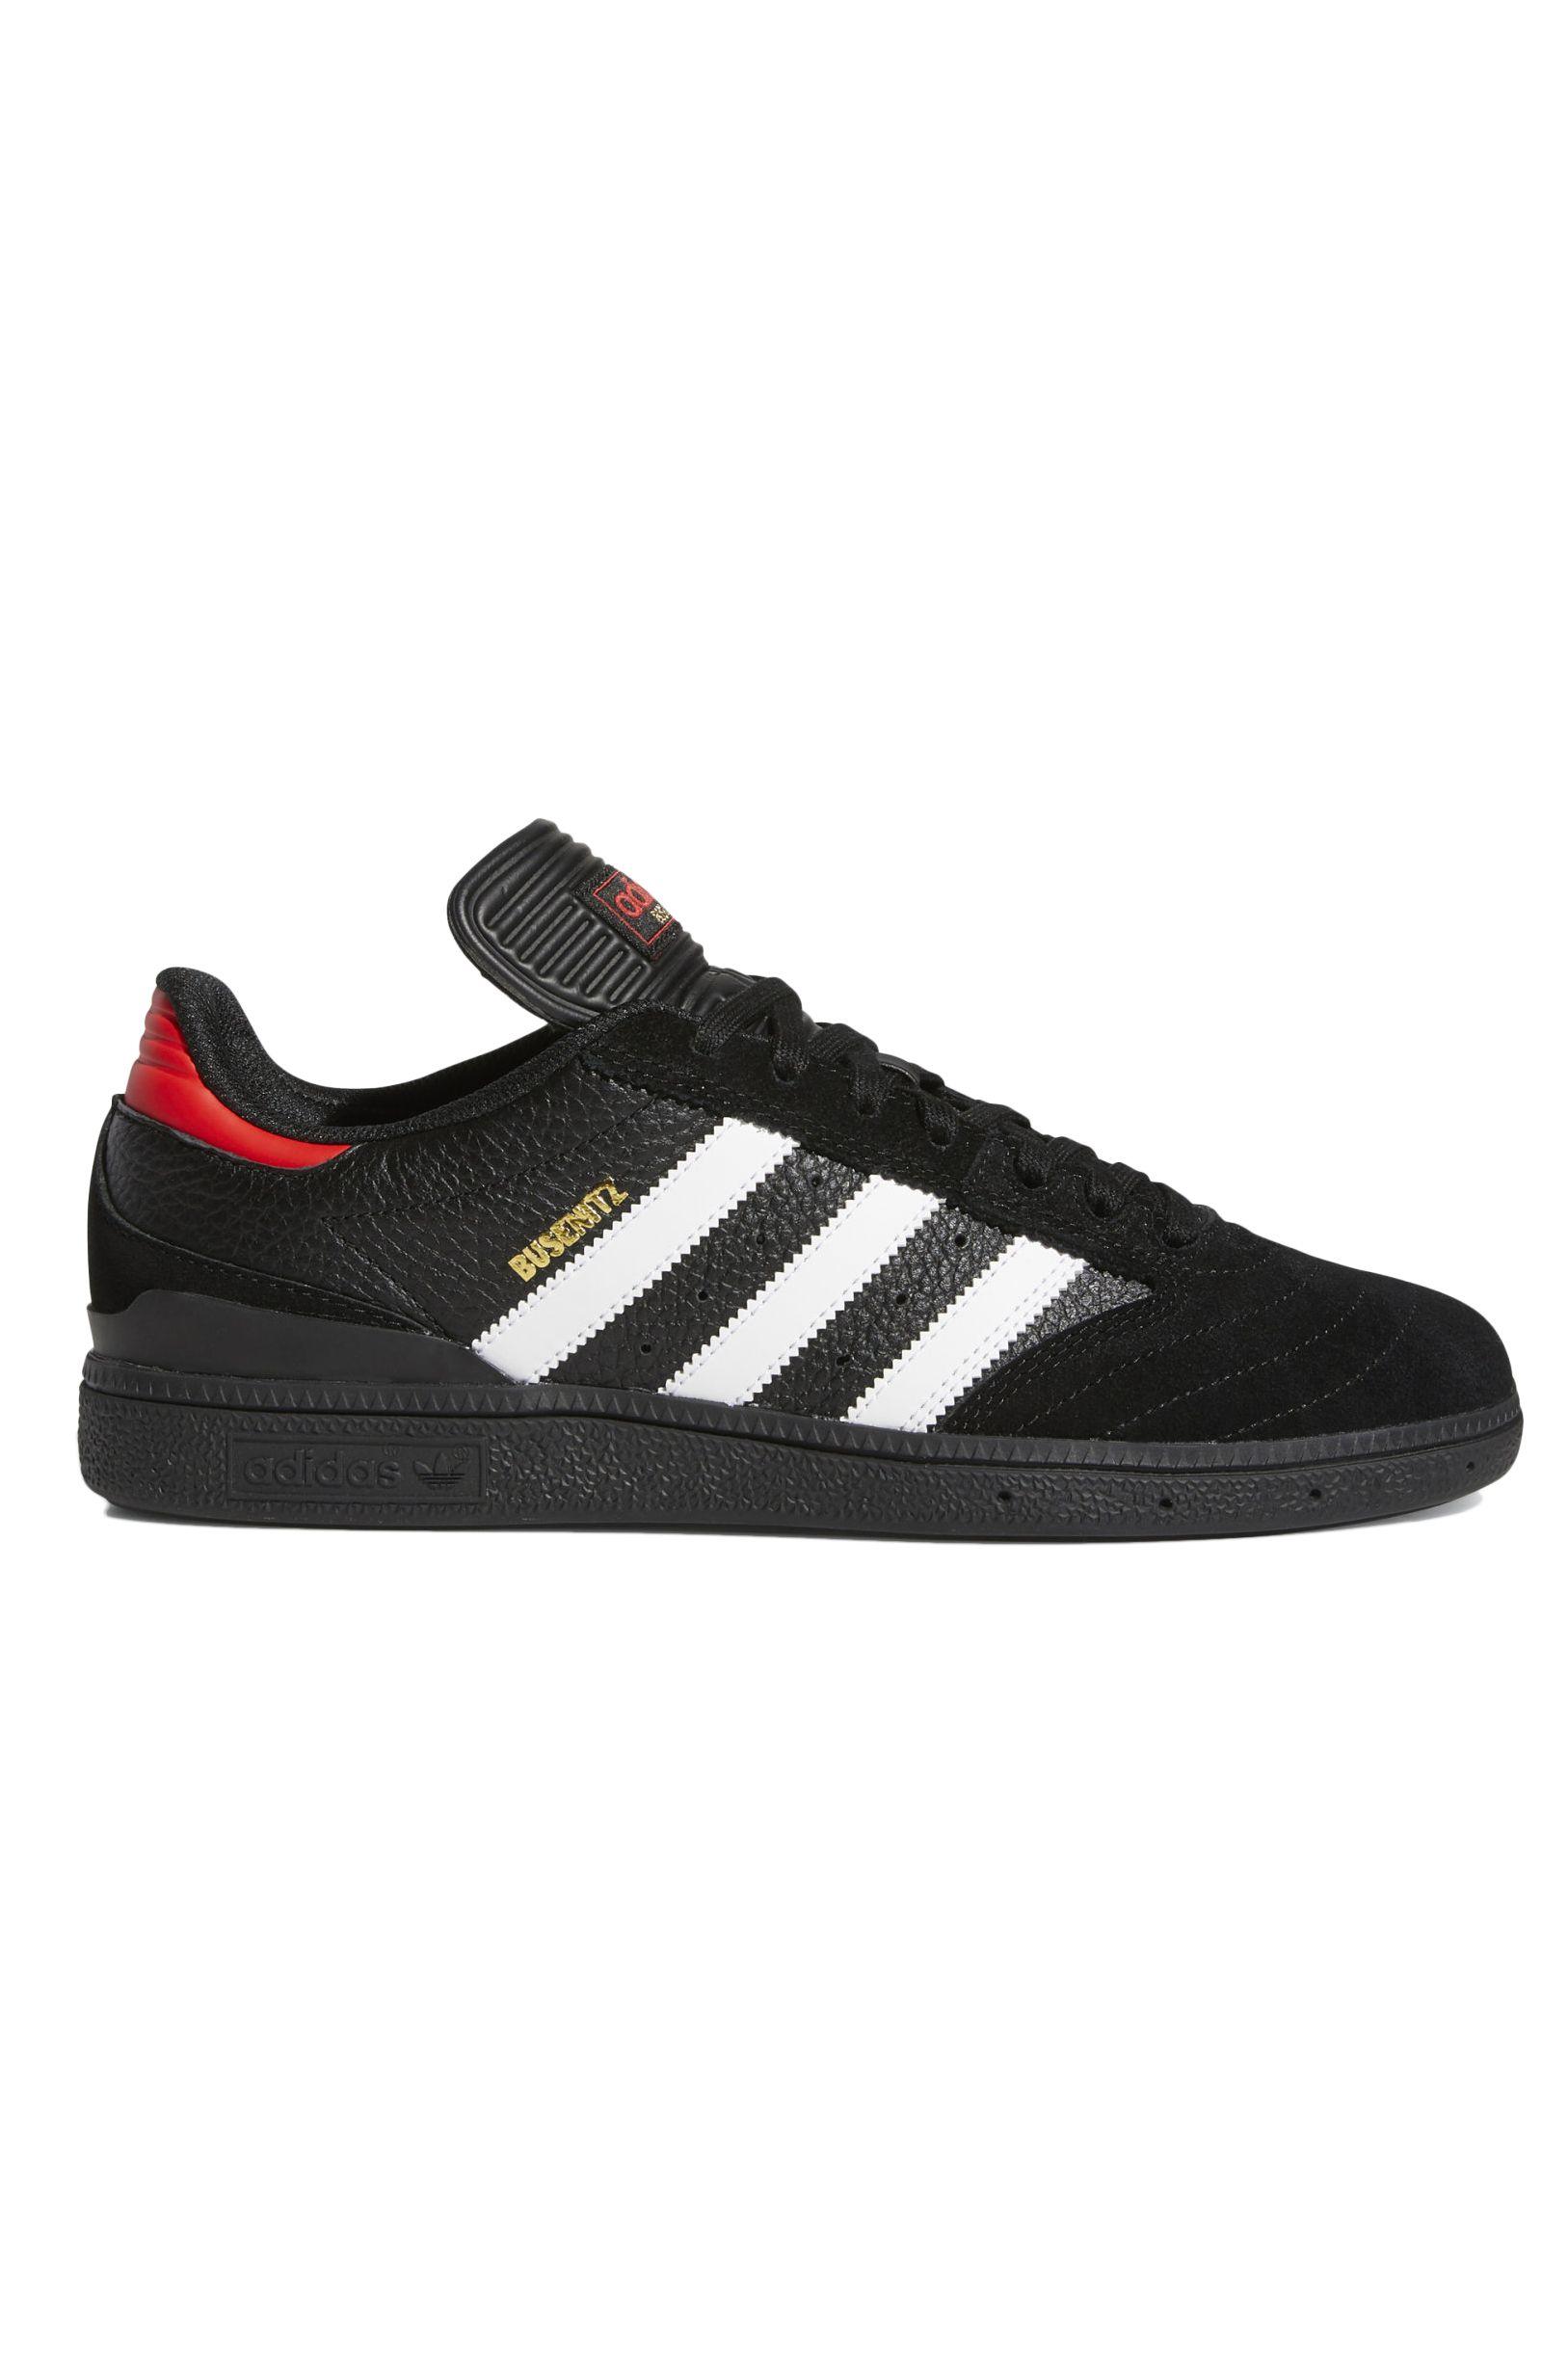 Tenis Adidas BUSENITZ Core Black/Ftwr White/Vivid Red